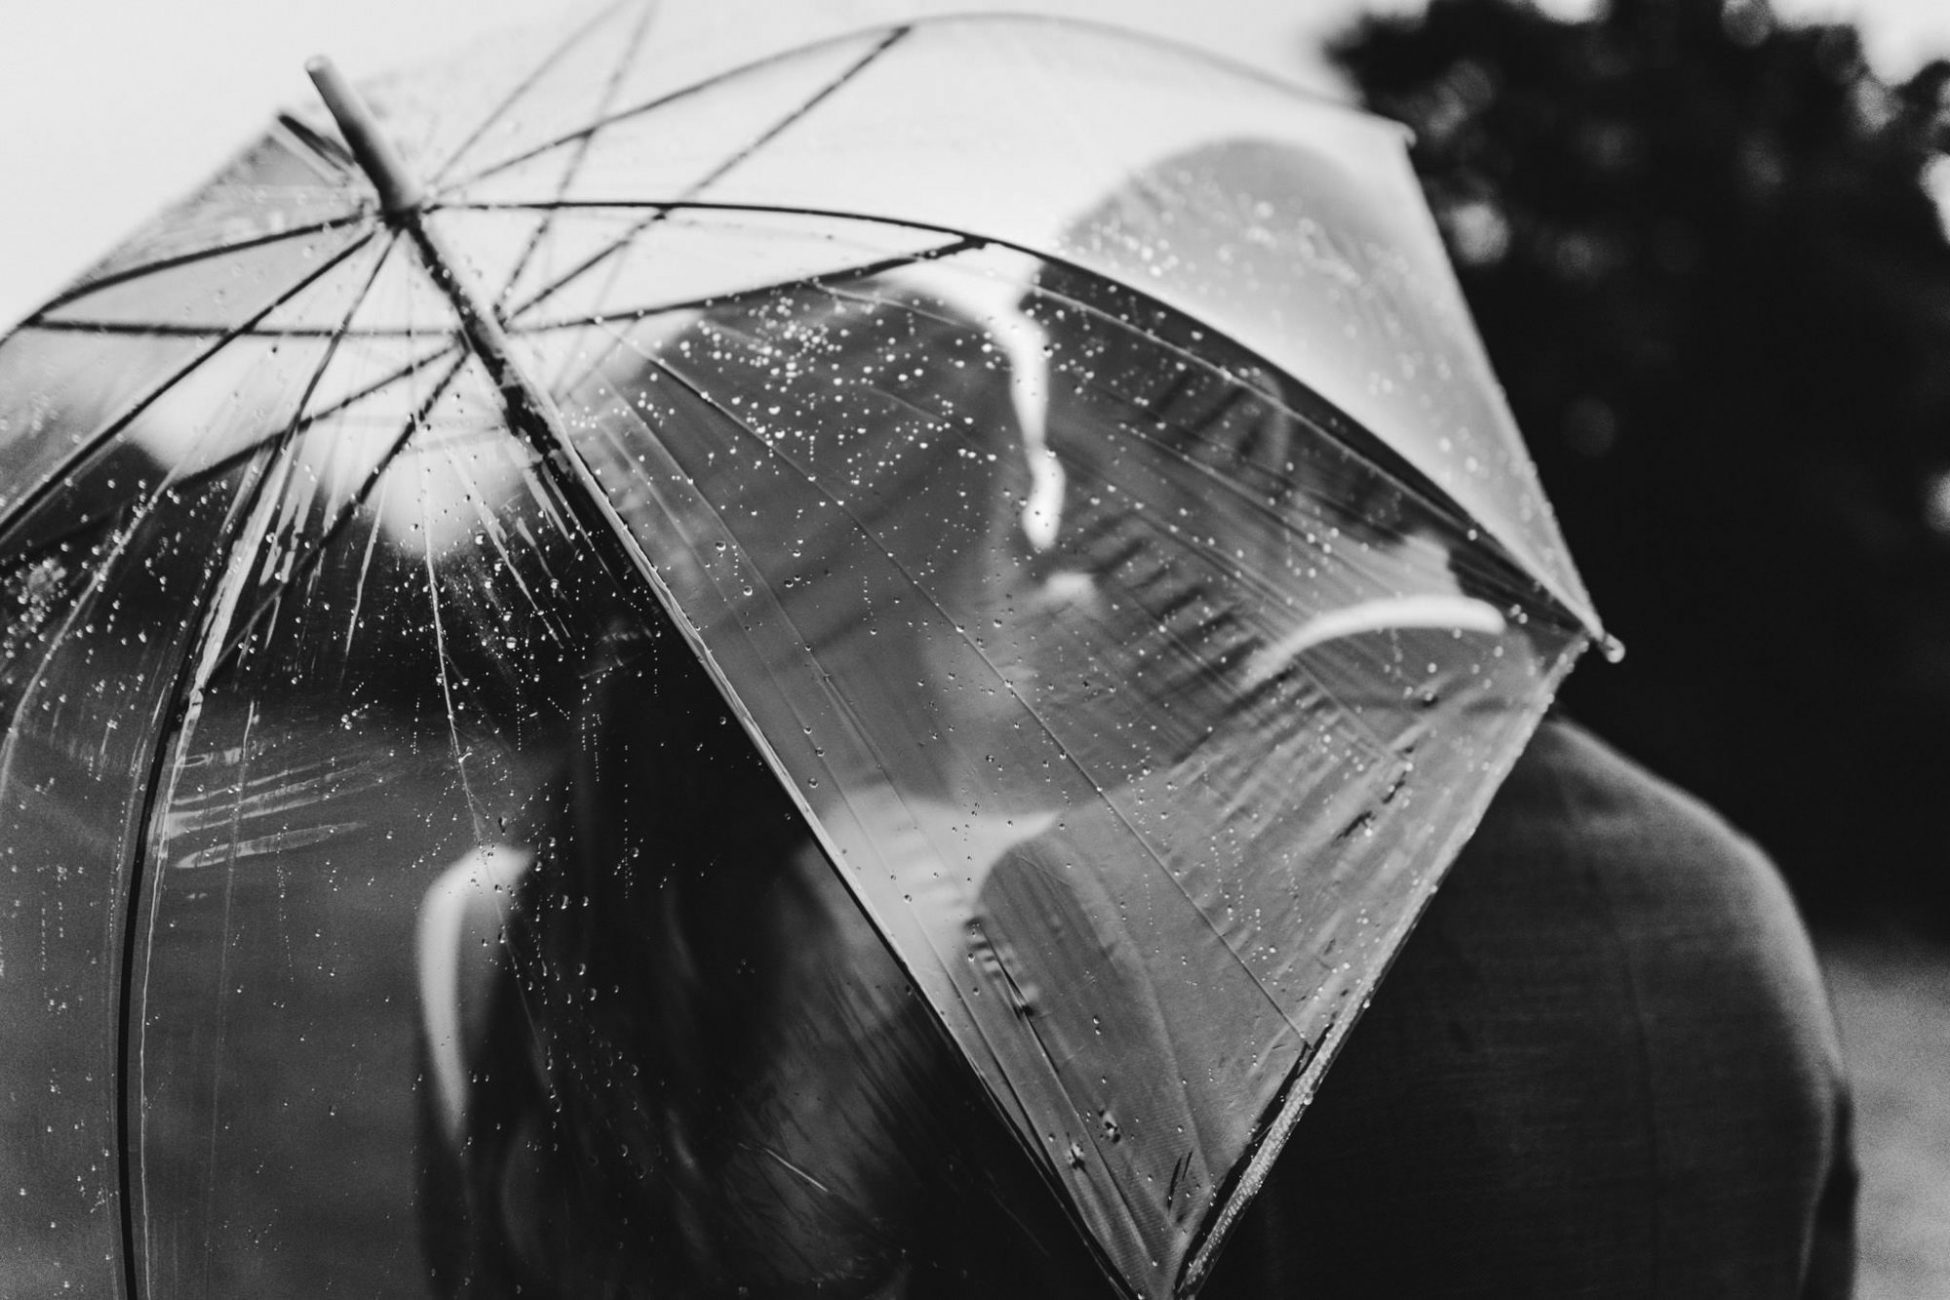 Rustic_wedding_The-Glades-Farm_KZN_Cr8tive-Duo_bride_groom_creative_shoot_couple_photoshoot_photography_videography_umbrella_rain